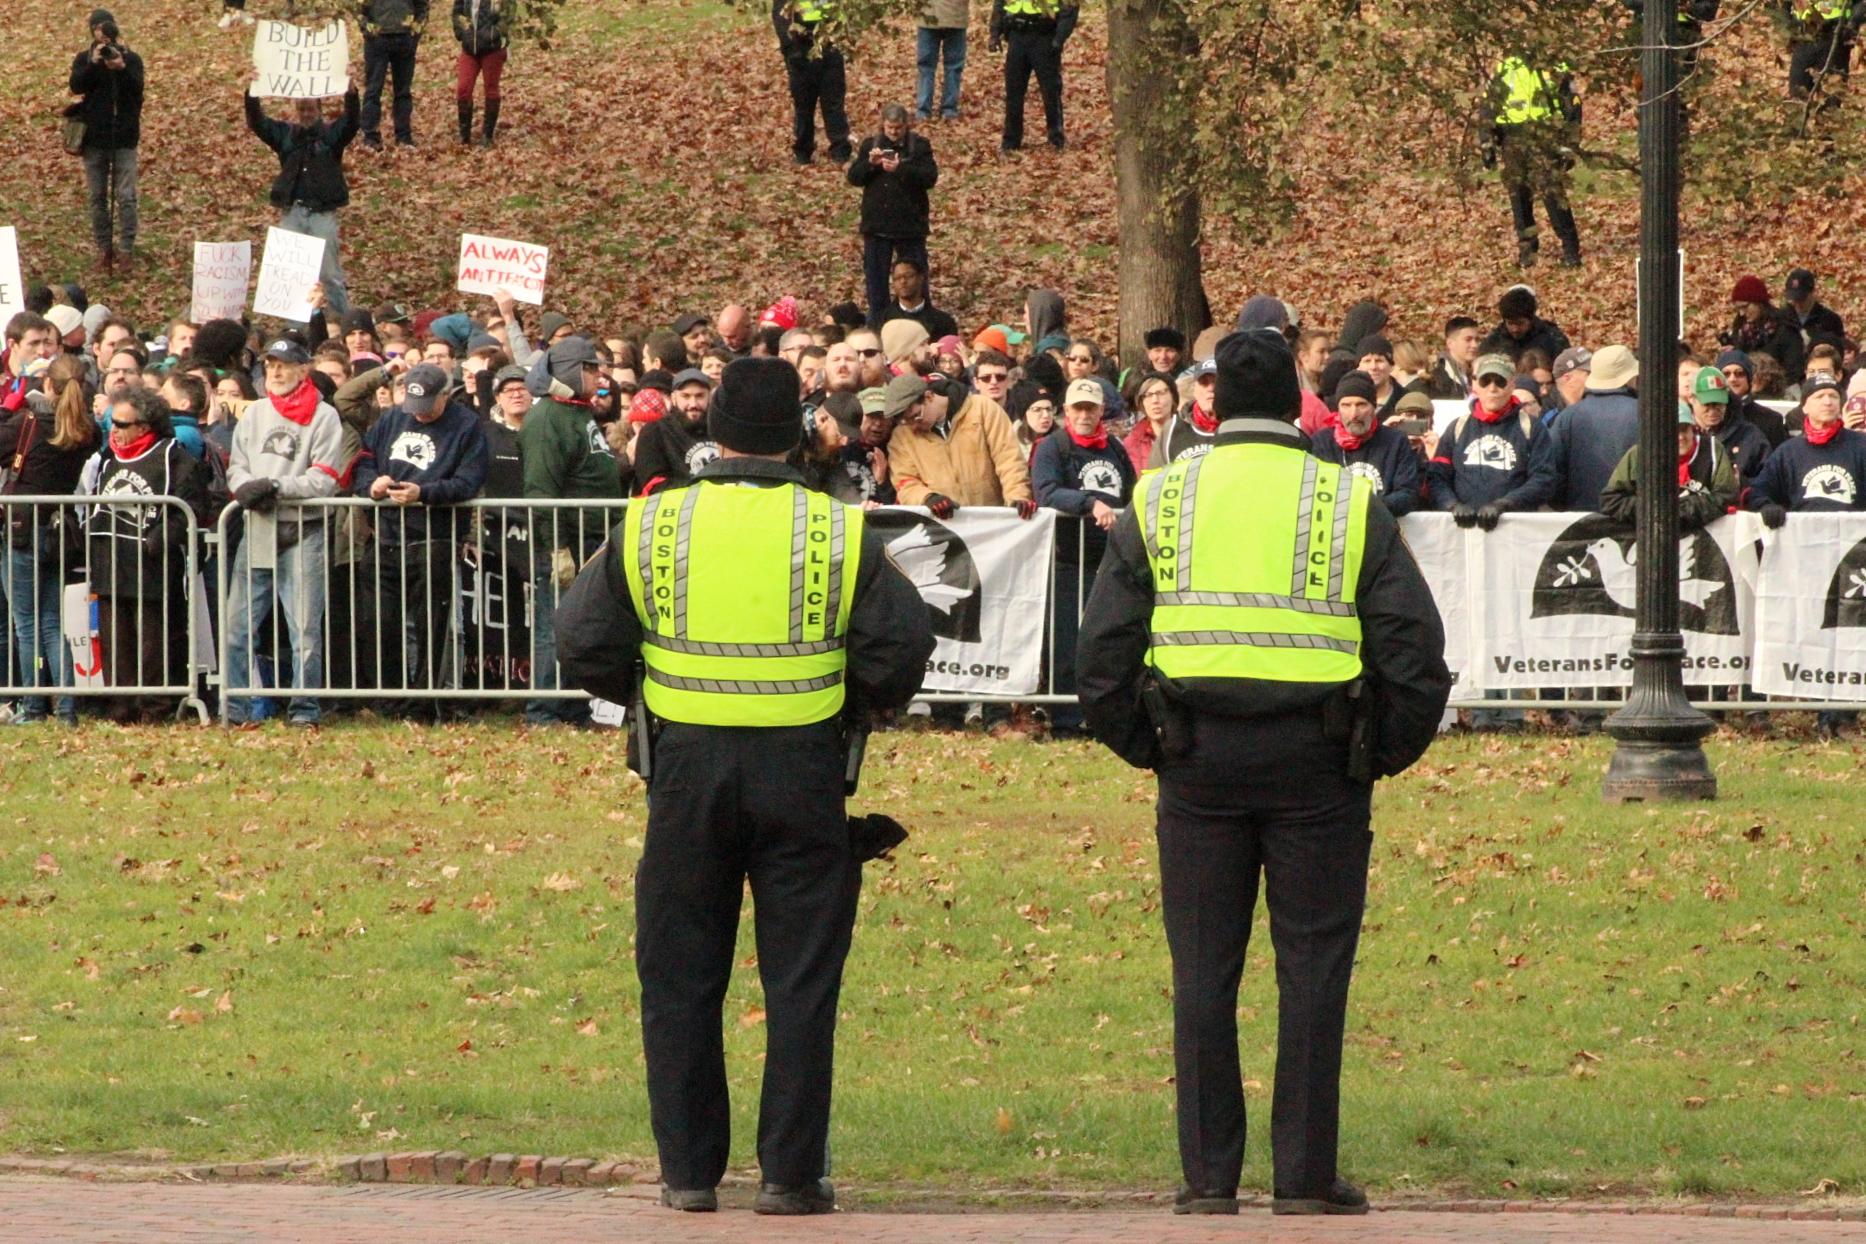 2017-11-18 Boston Common Free Speech Rally 02